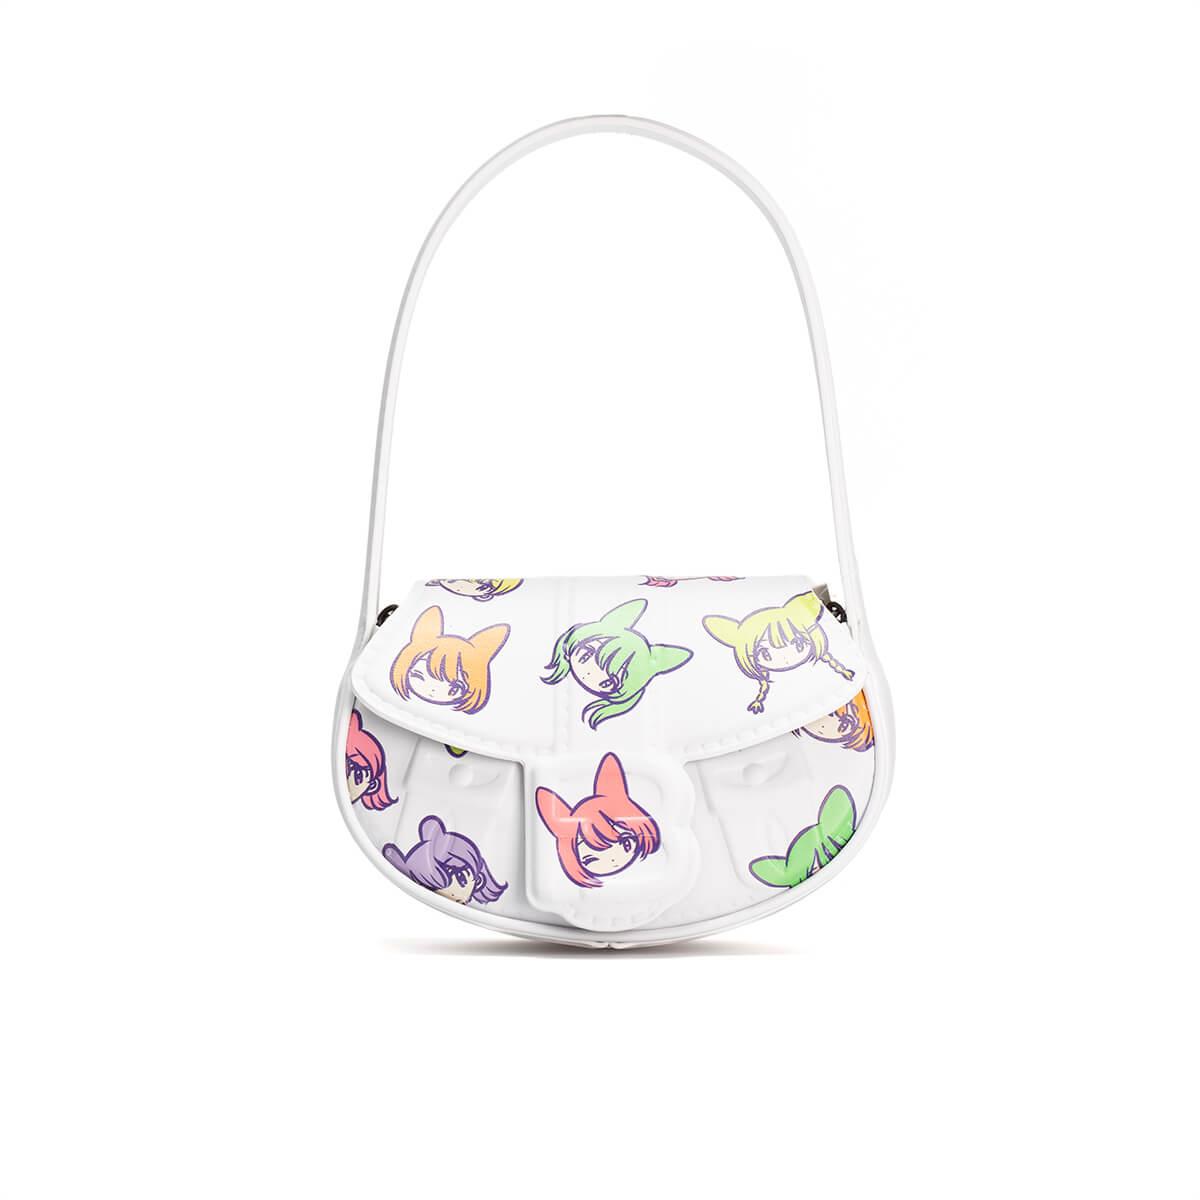 My Boo Bag 6